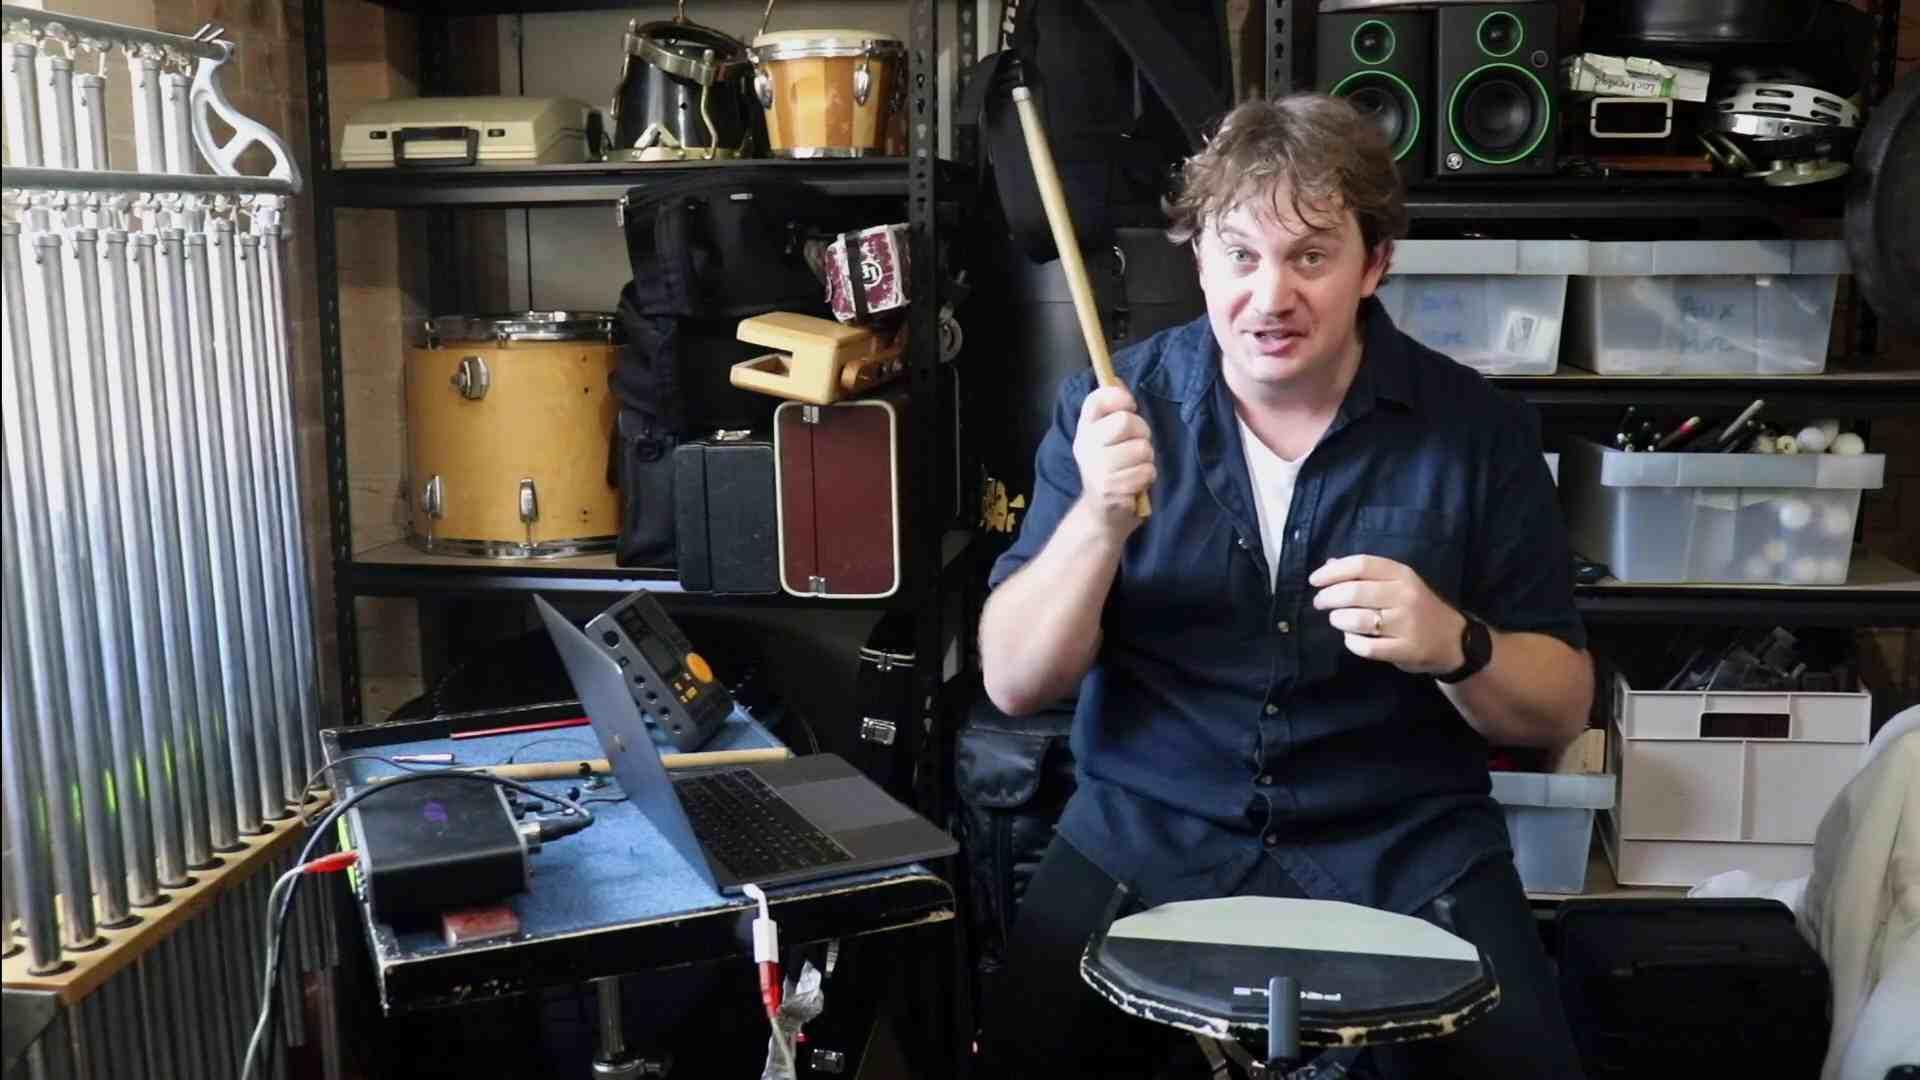 Drumming – 1. Sticking to the basics